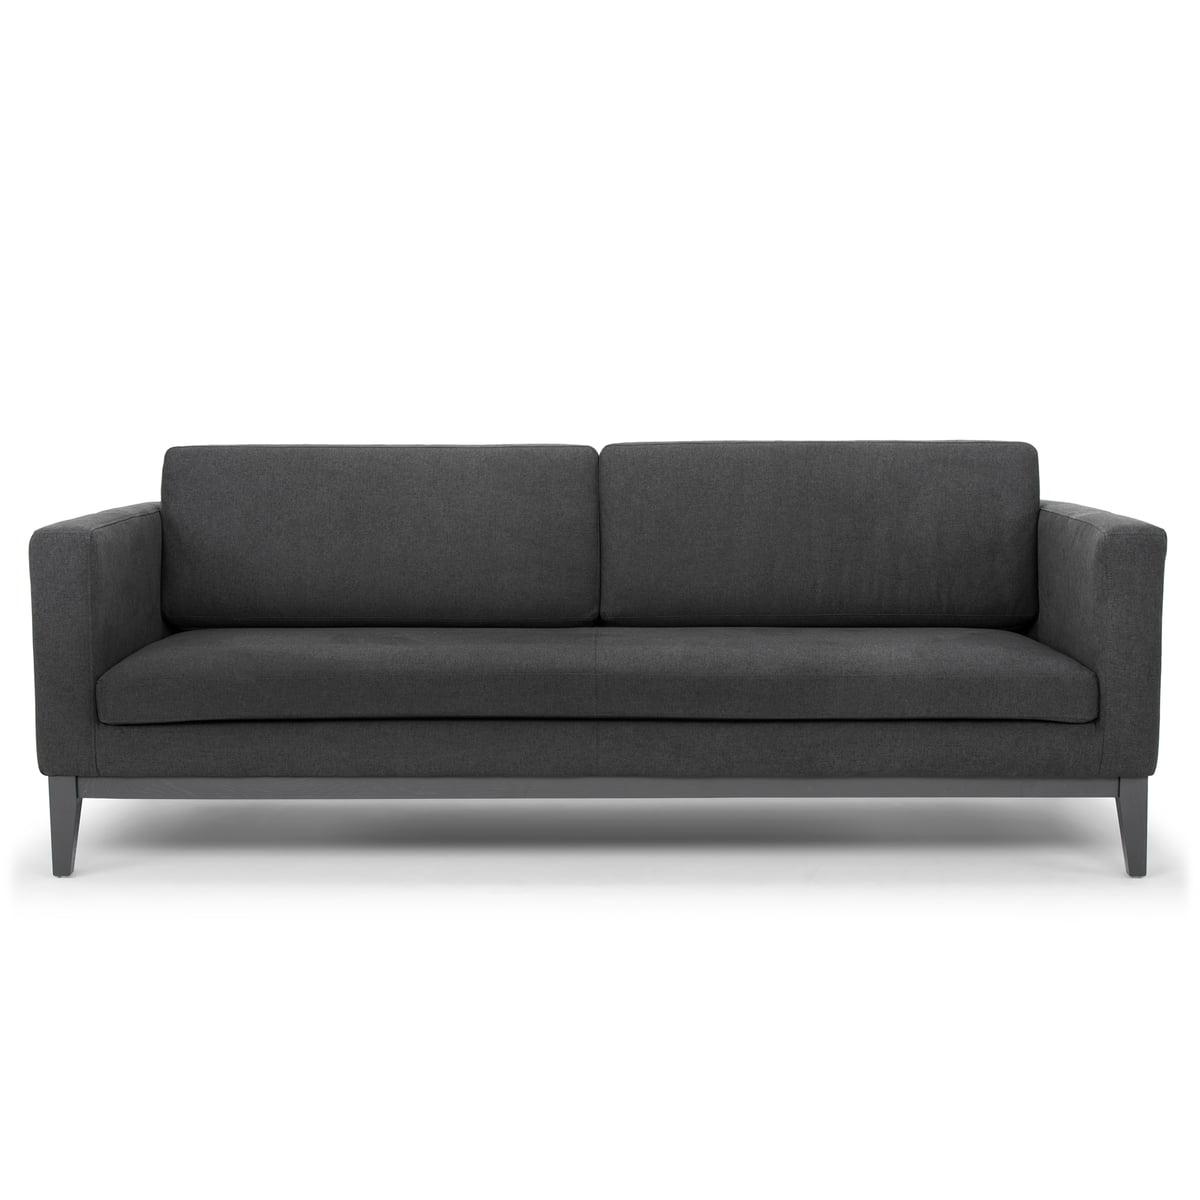 Einzigartig Couch Dunkelgrau Foto Von Design E Stockholm - Day Dream Sofa,